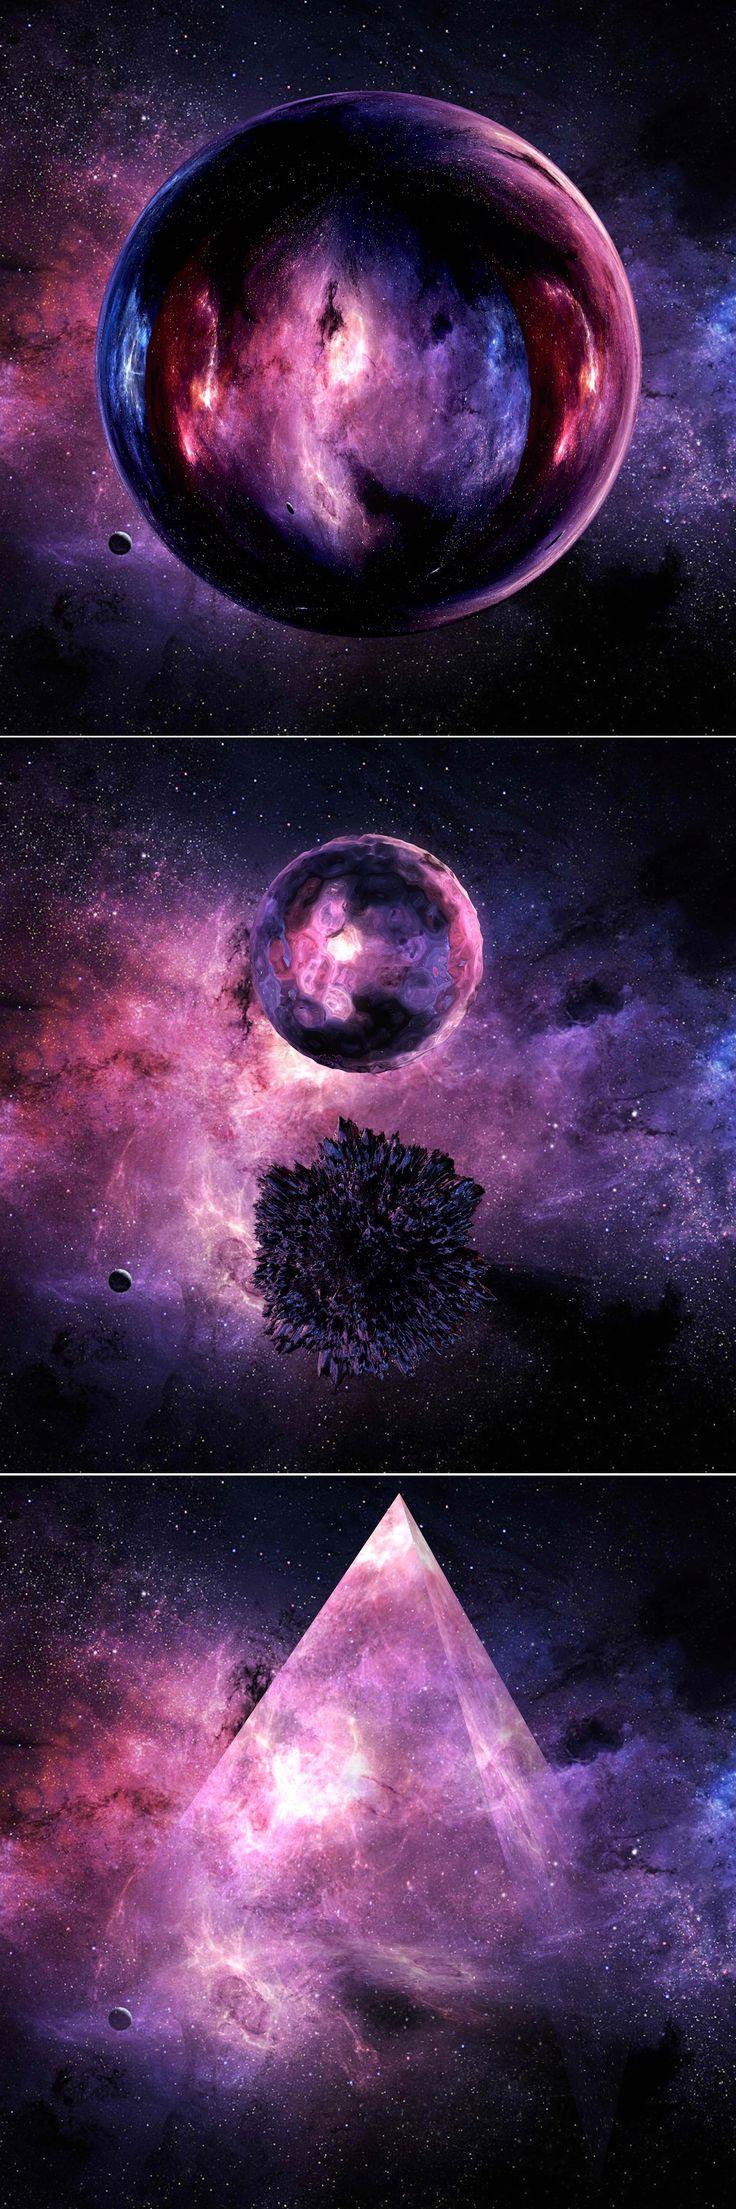 "Day 9: ""Inner Life"" by Drasko V #create #daily #art #universe #design #scifi #alien #space #experimental"